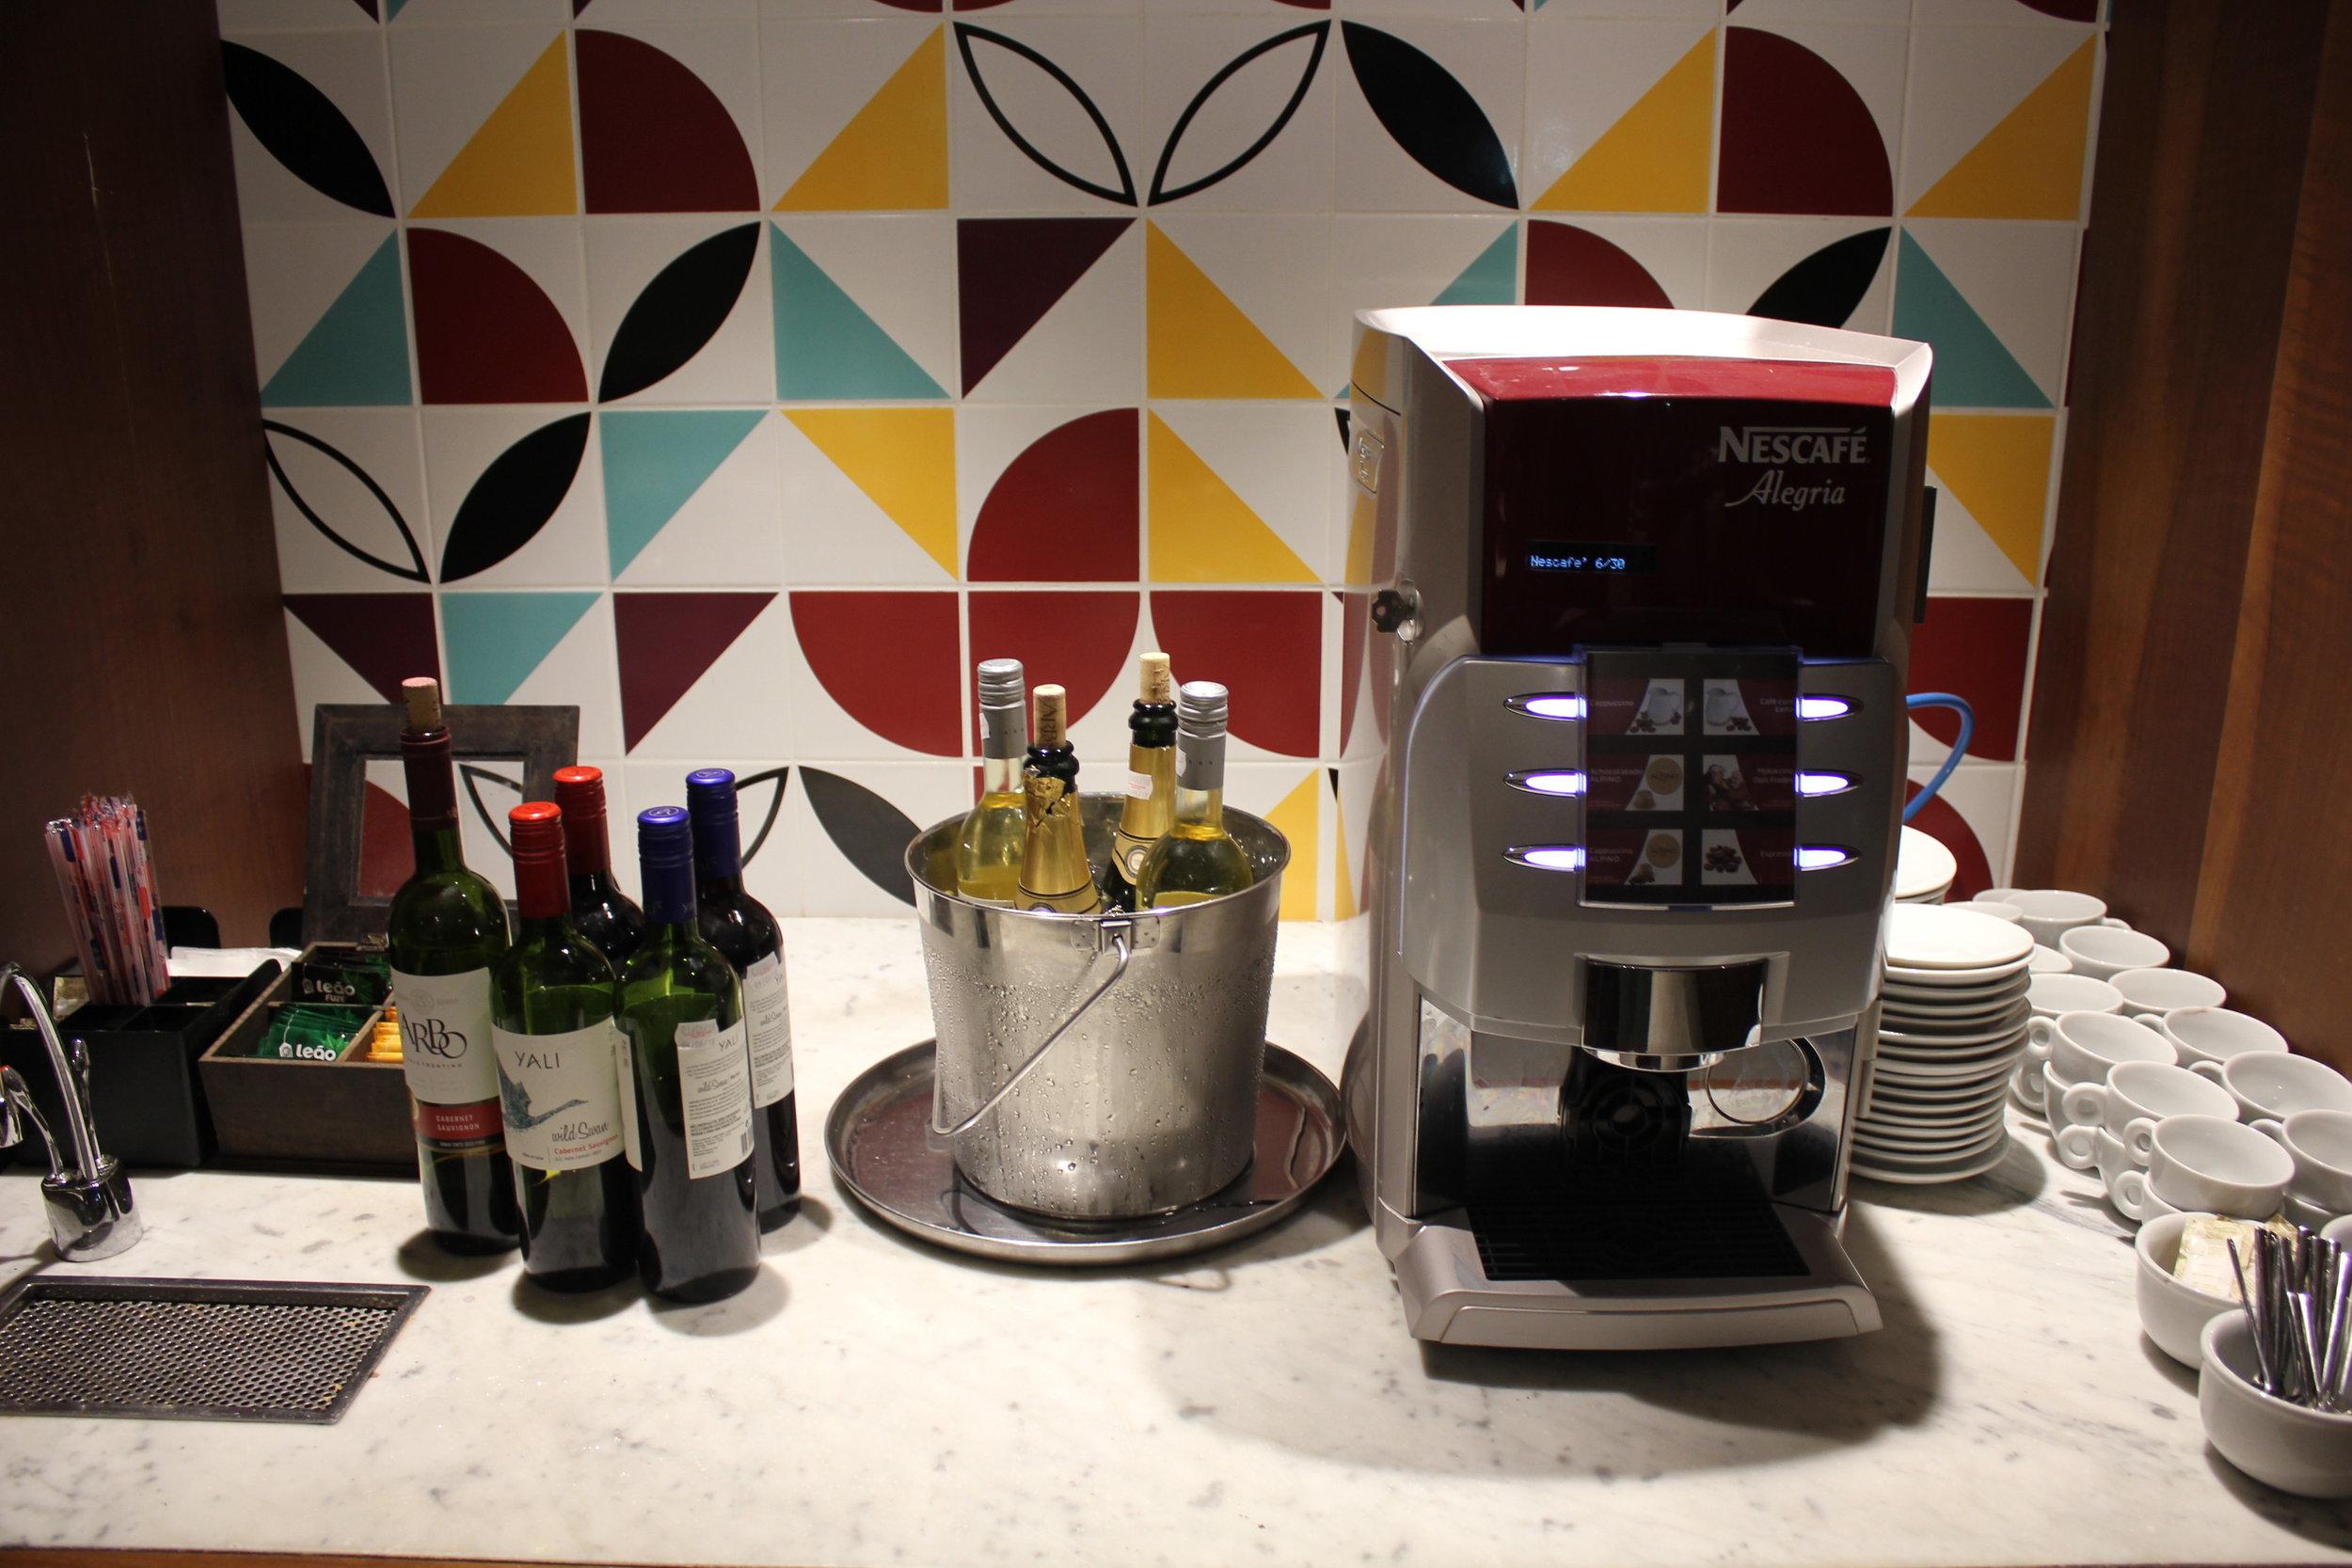 Star Alliance Lounge Rio de Janeiro – Self-serve drinks